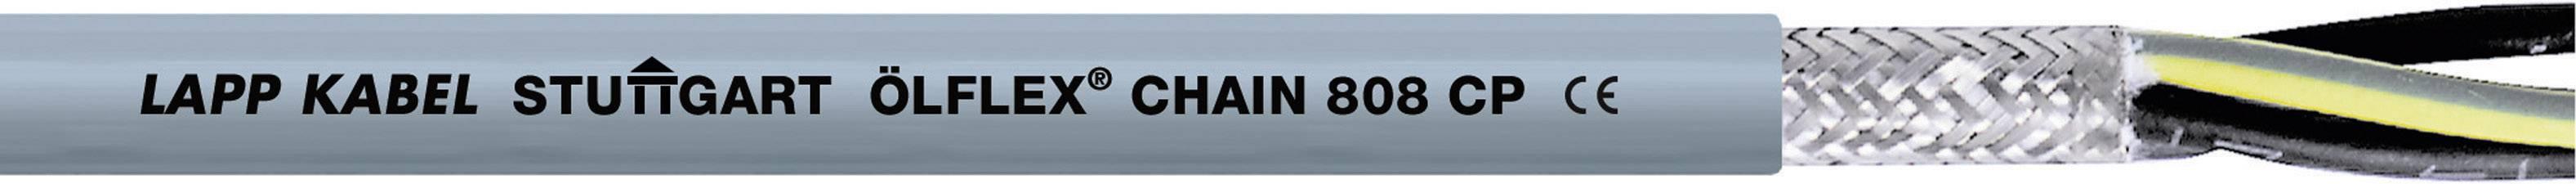 Žíla kabelu LappKabel ÖLFLEX CHAIN 808 CP 25G0,5 (1027758), 25x 0,5 mm², polyurethan, Ø 14,1 mm, stíněný, 50 m